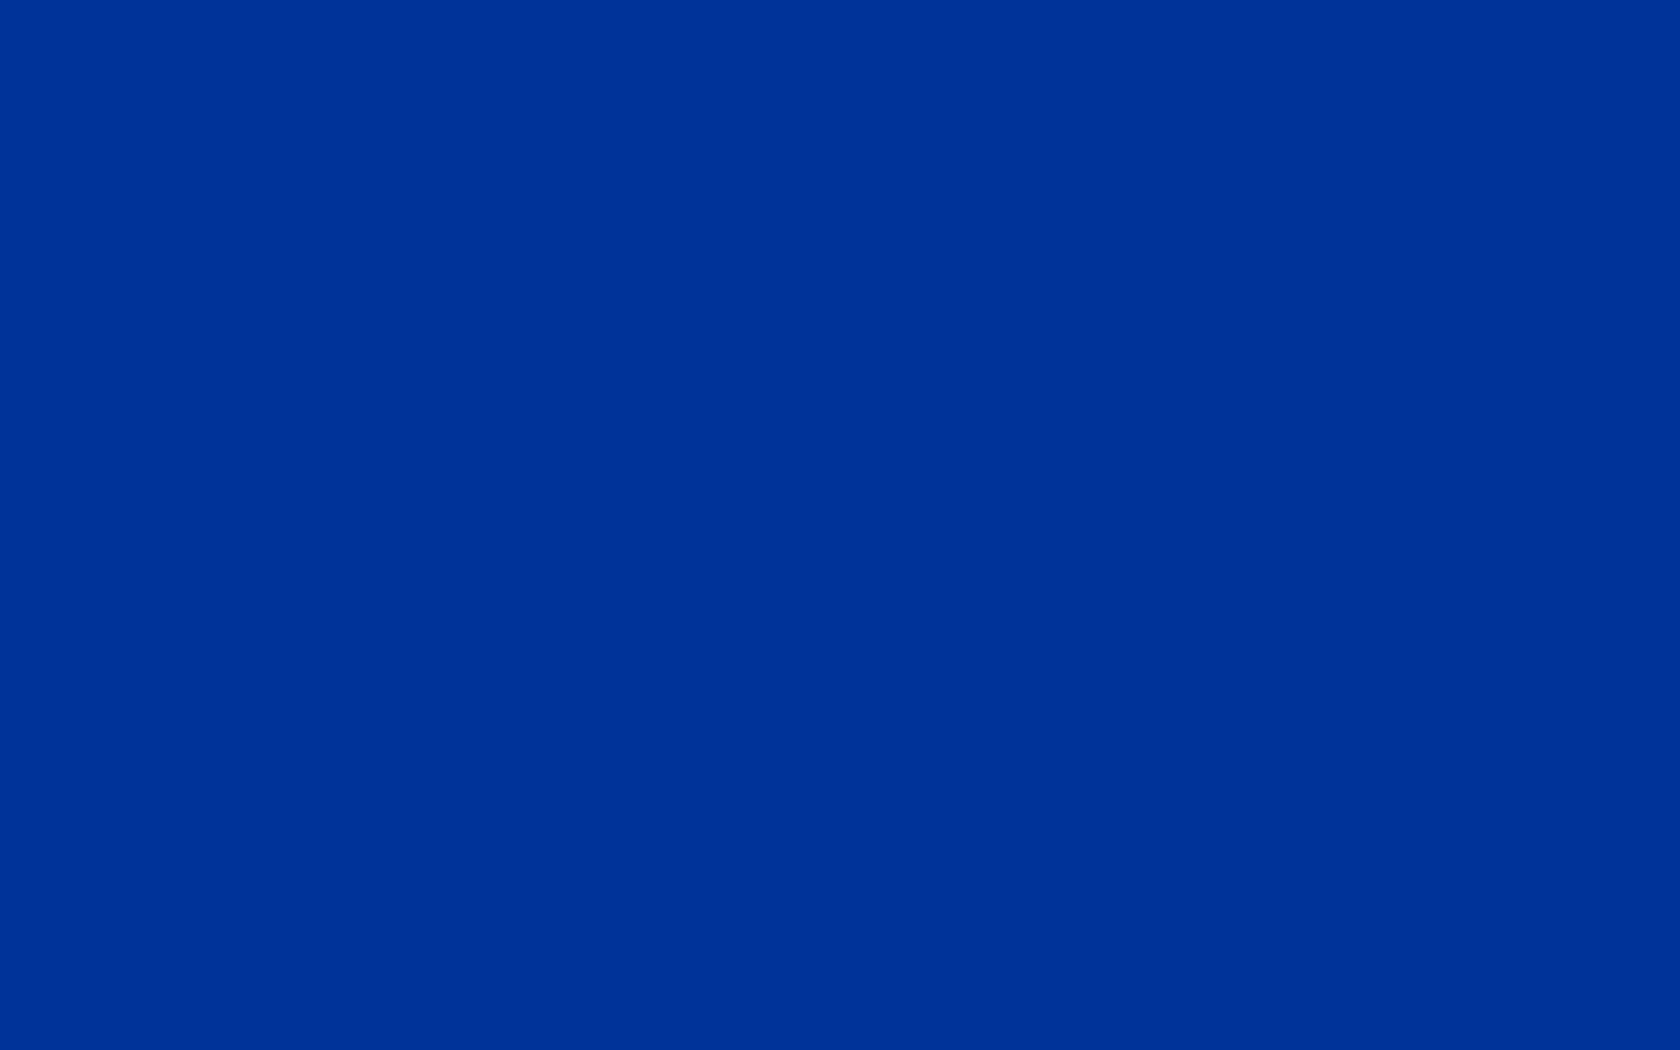 1680x1050 Smalt Dark Powder Blue Solid Color Background